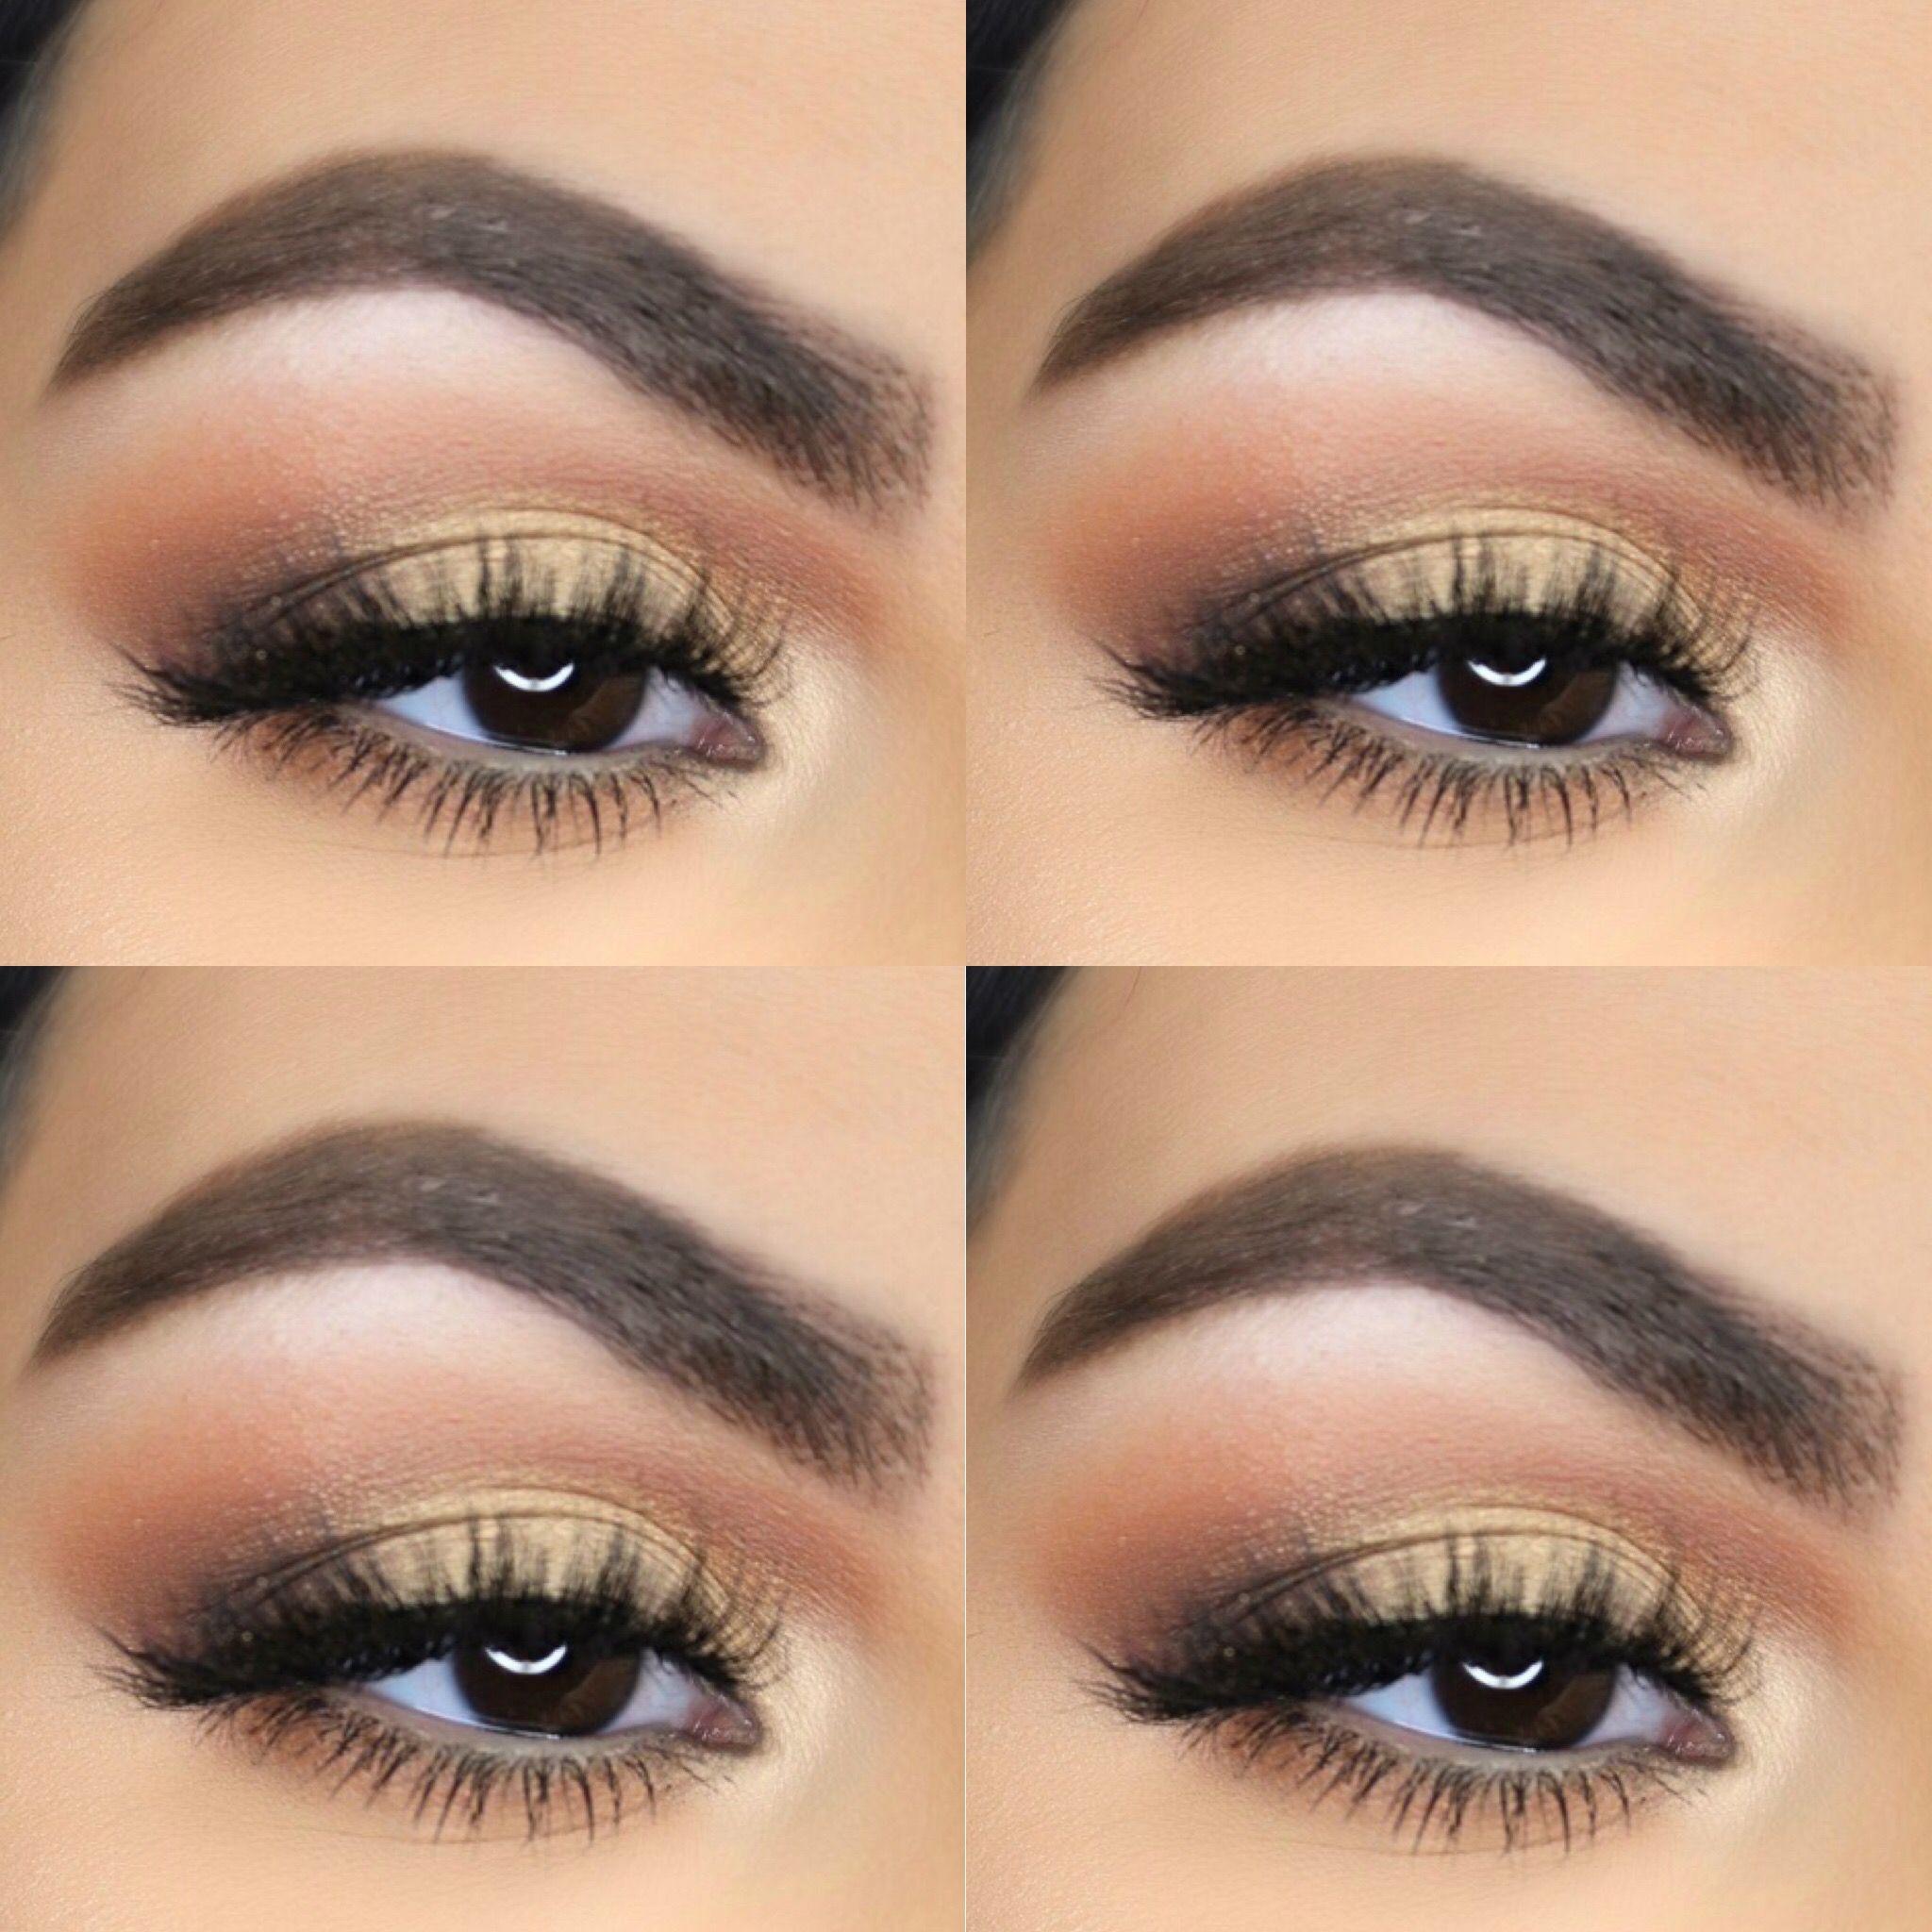 Soft glam eye makeup using Anastasia Beverly Hills Soft